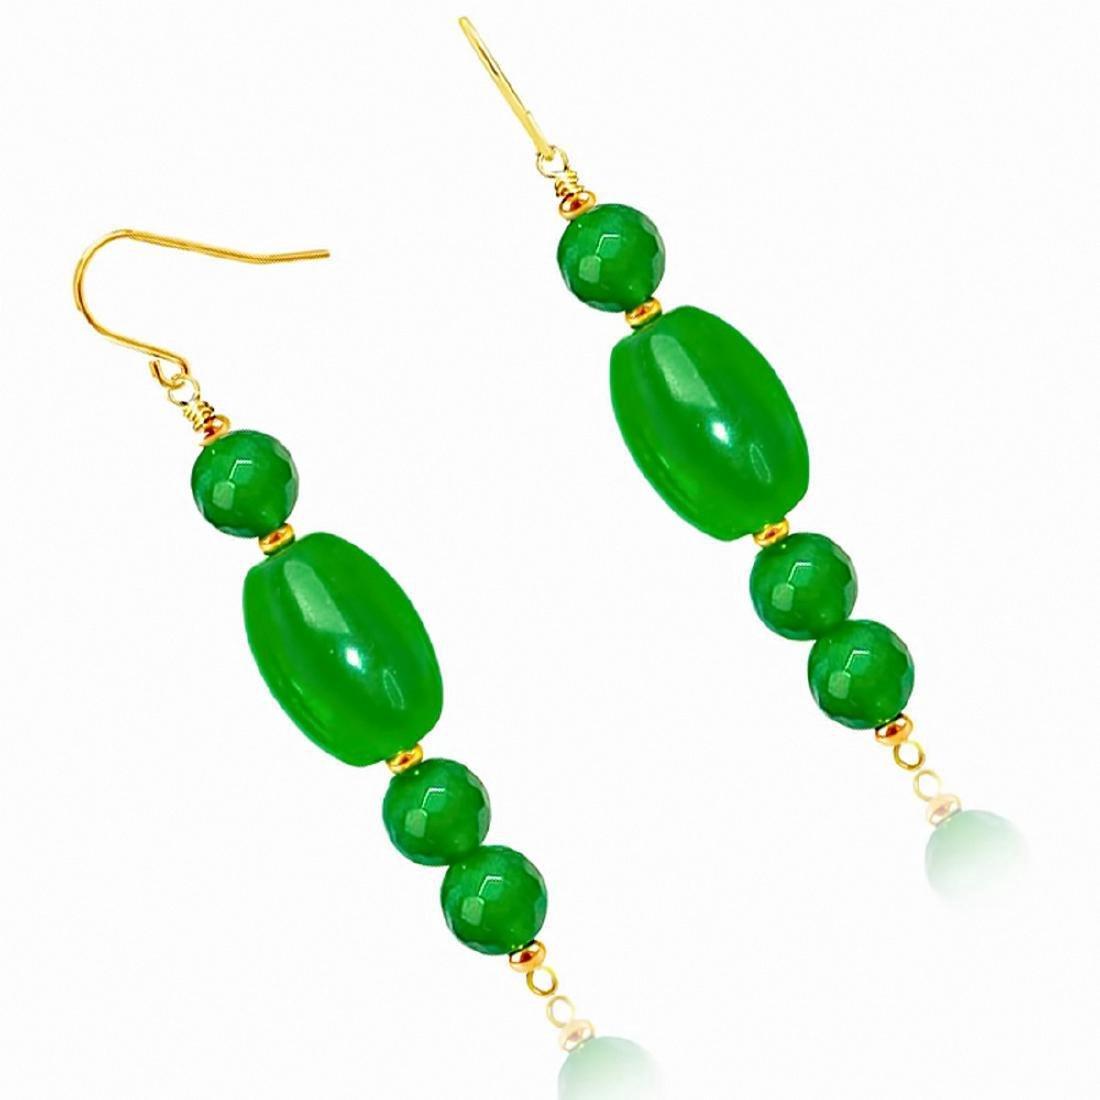 14kt Gold Drop Imperial Jade Earrings - 2